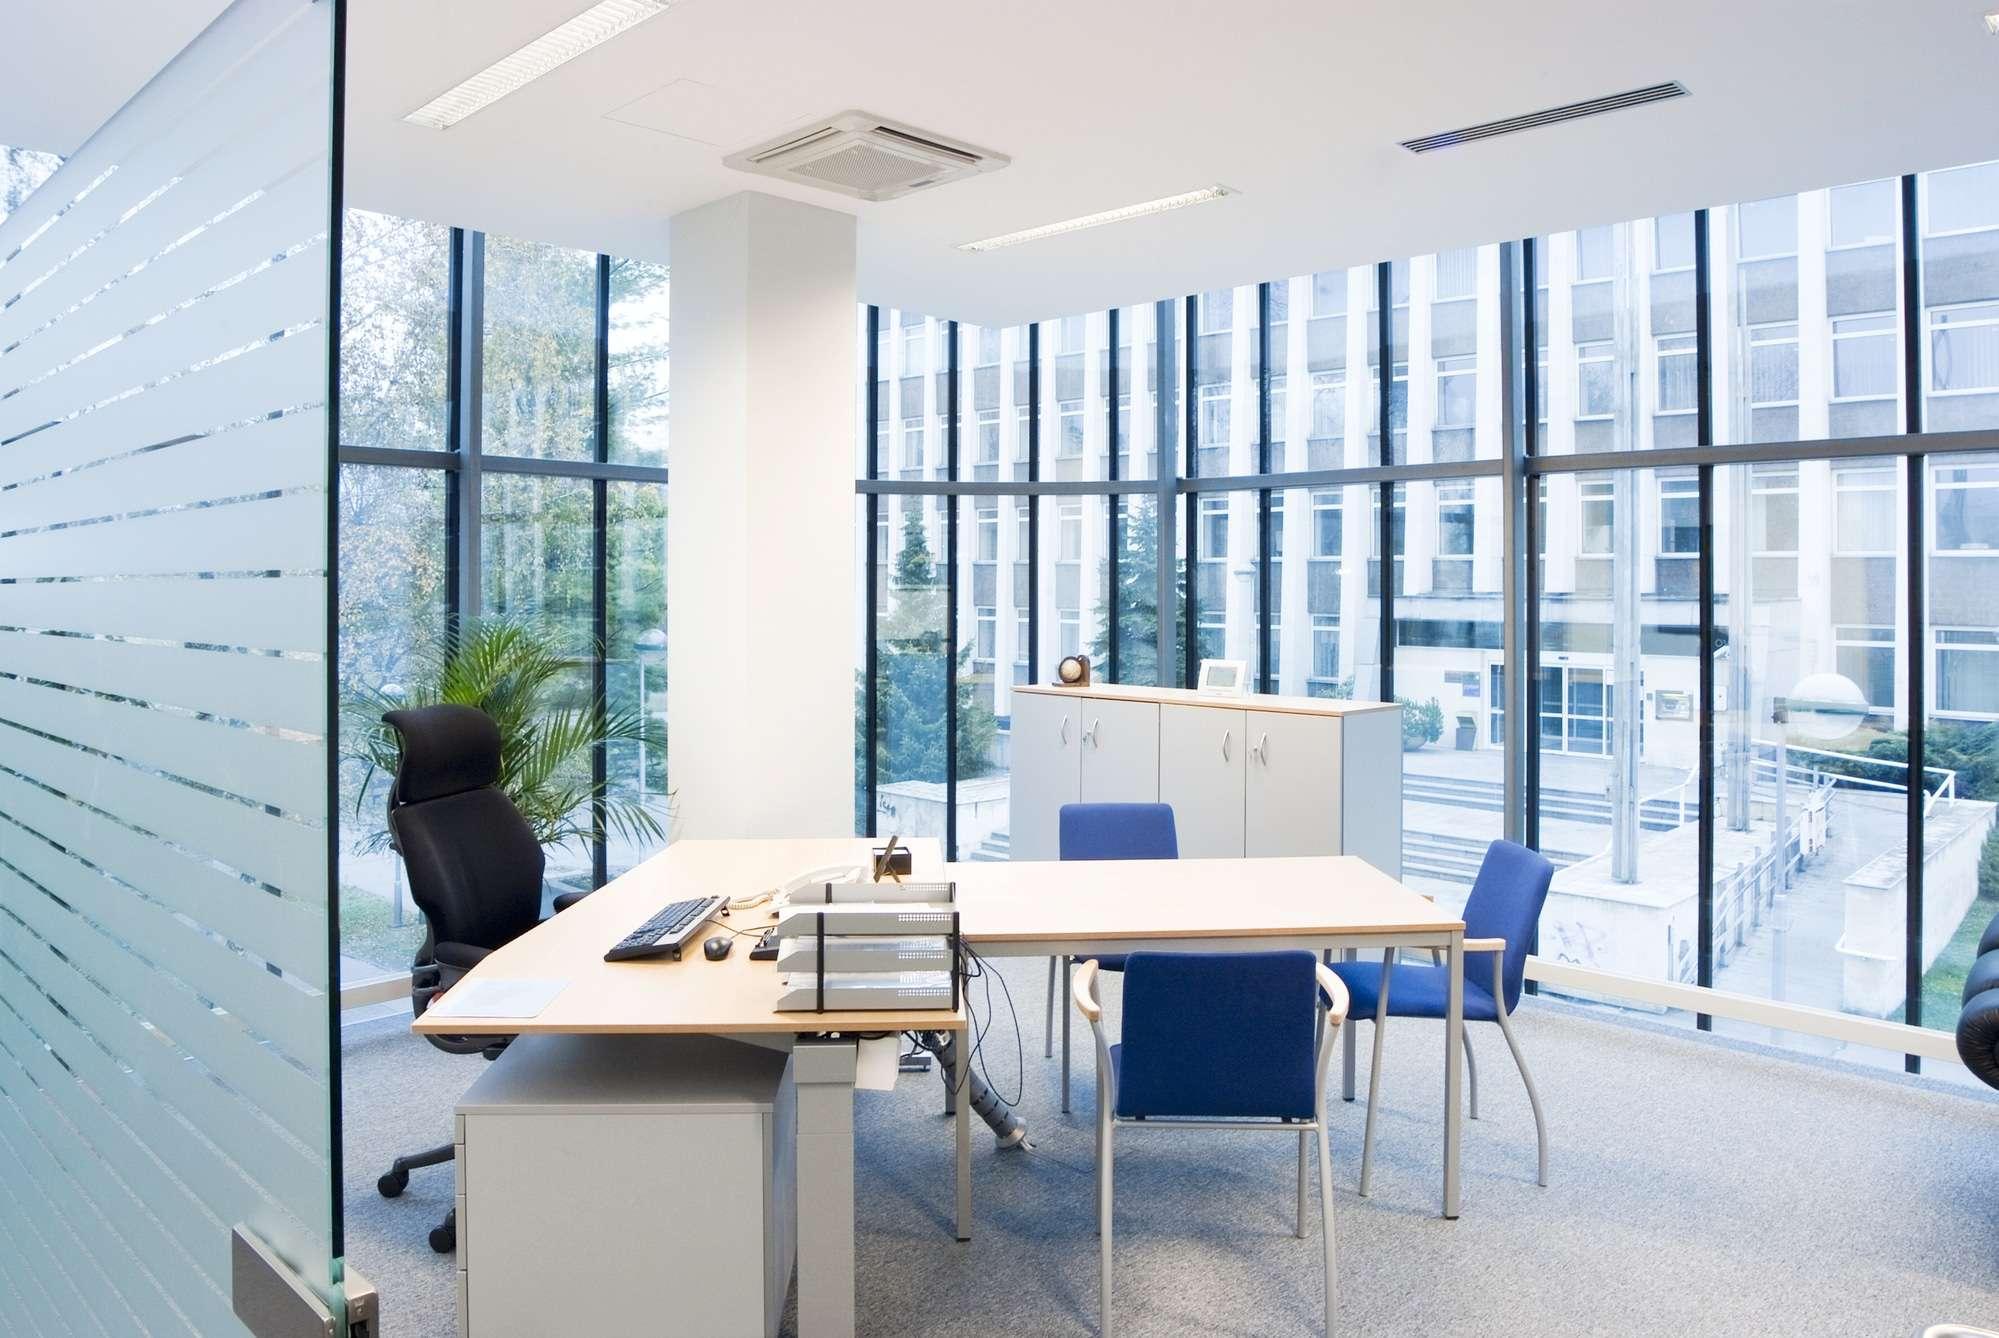 Empty office workplace